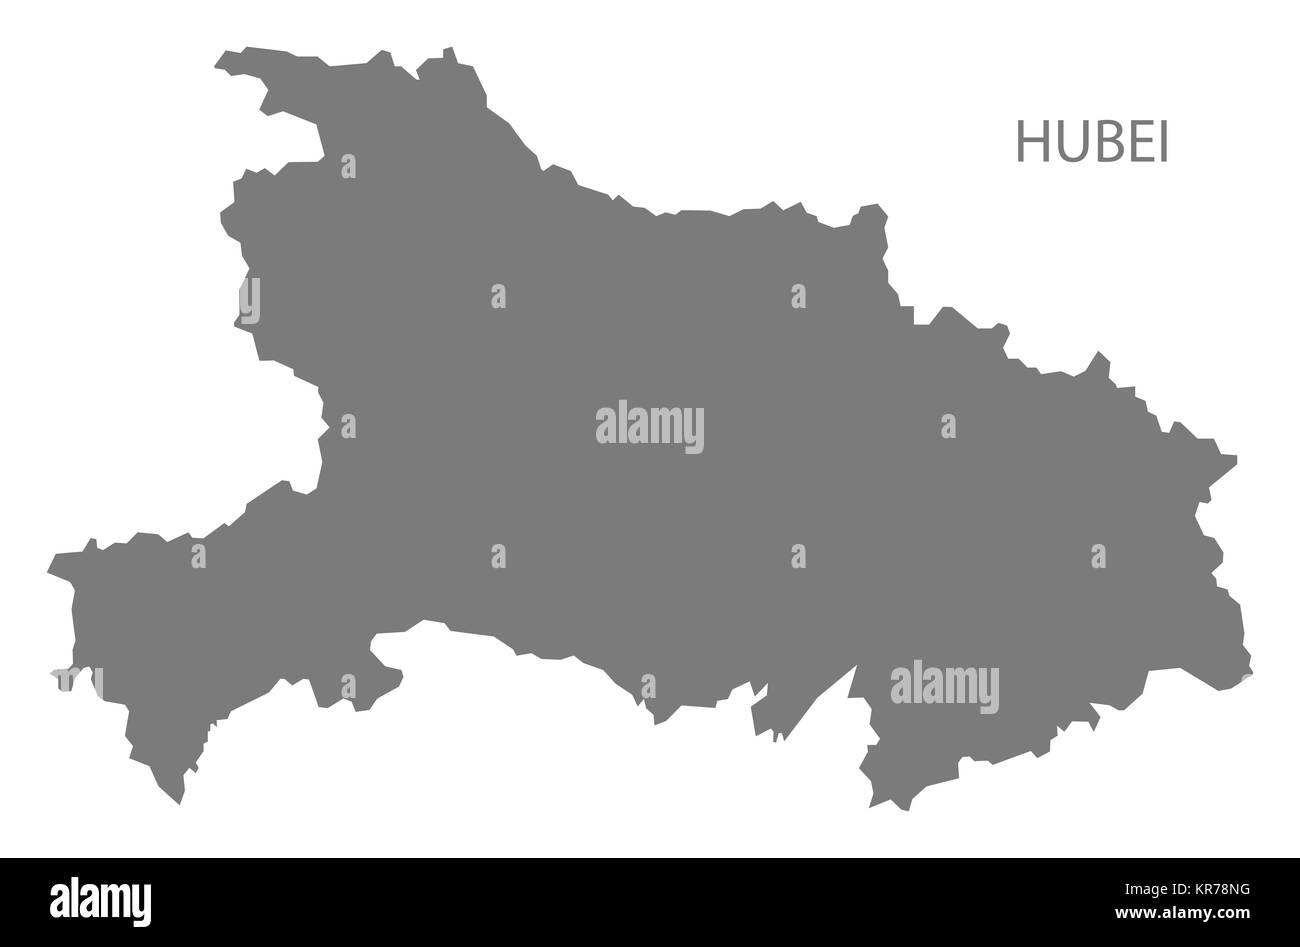 Hubei Map Vector Stock Photos Hubei Map Vector Stock Images Alamy